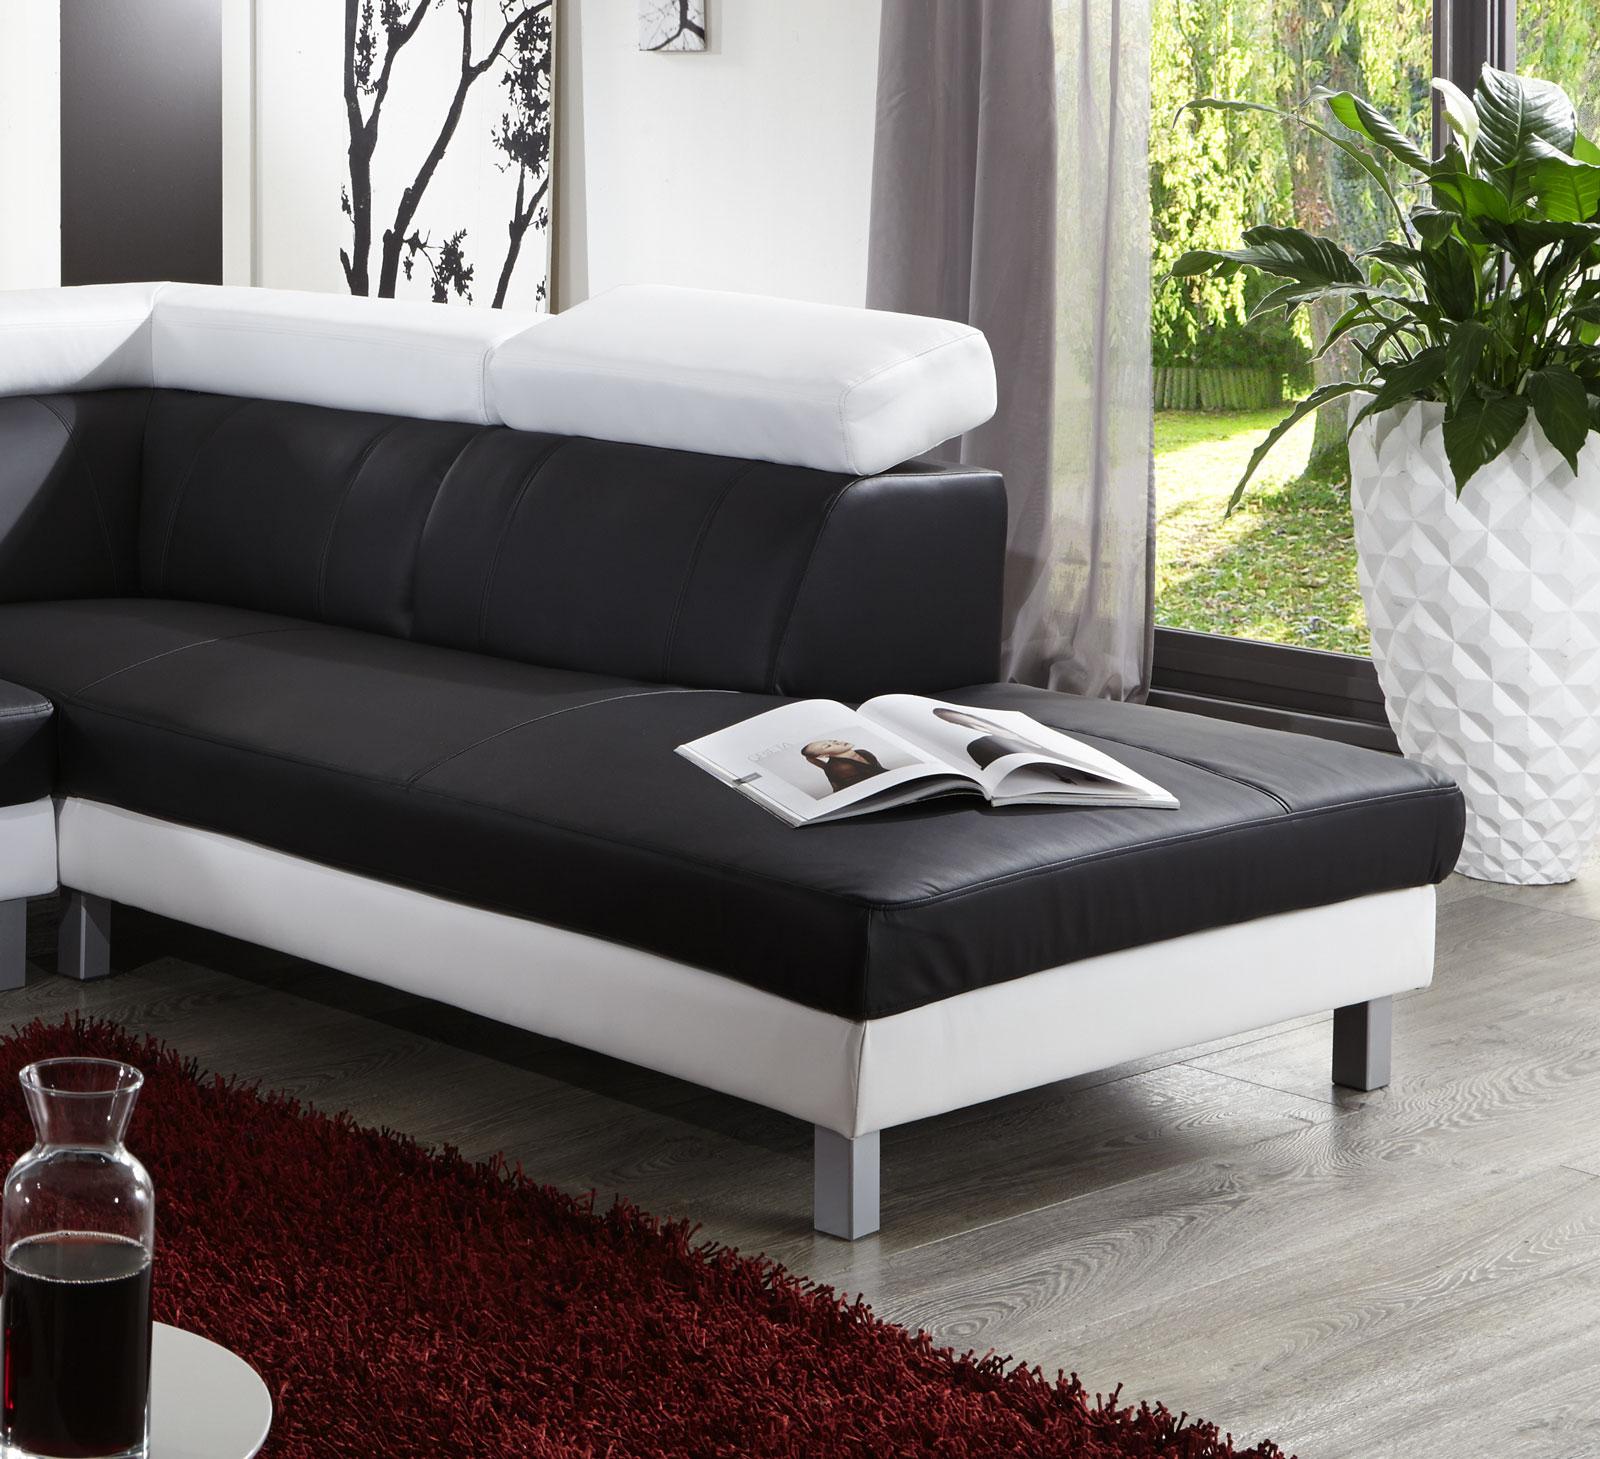 polsterecke trkis perfect ecksofa nango ii mit beidseitig montierbar with polsterecke trkis. Black Bedroom Furniture Sets. Home Design Ideas